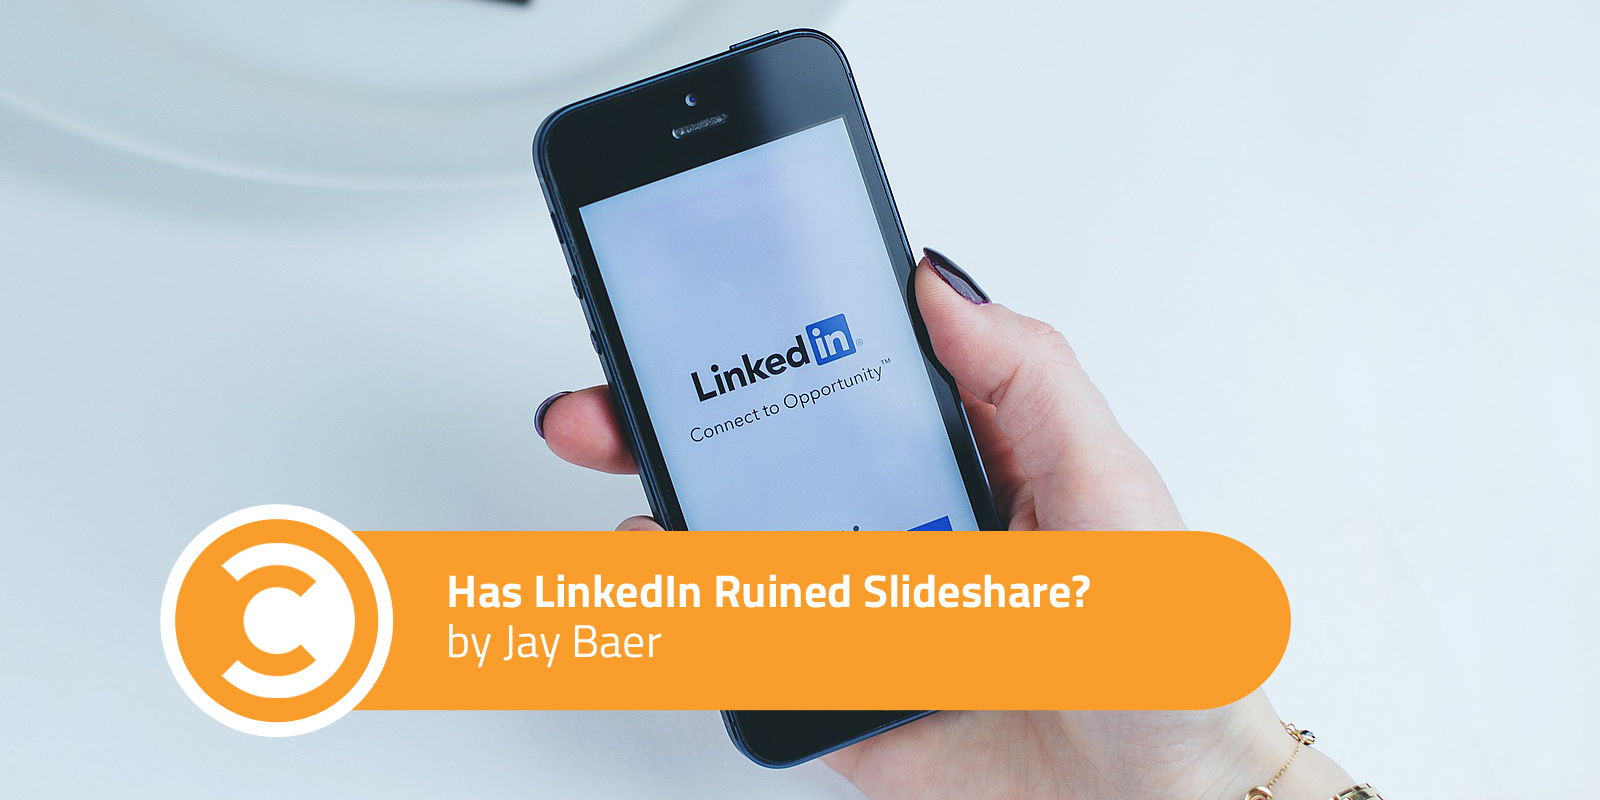 Has LinkedIn Ruined Slideshare